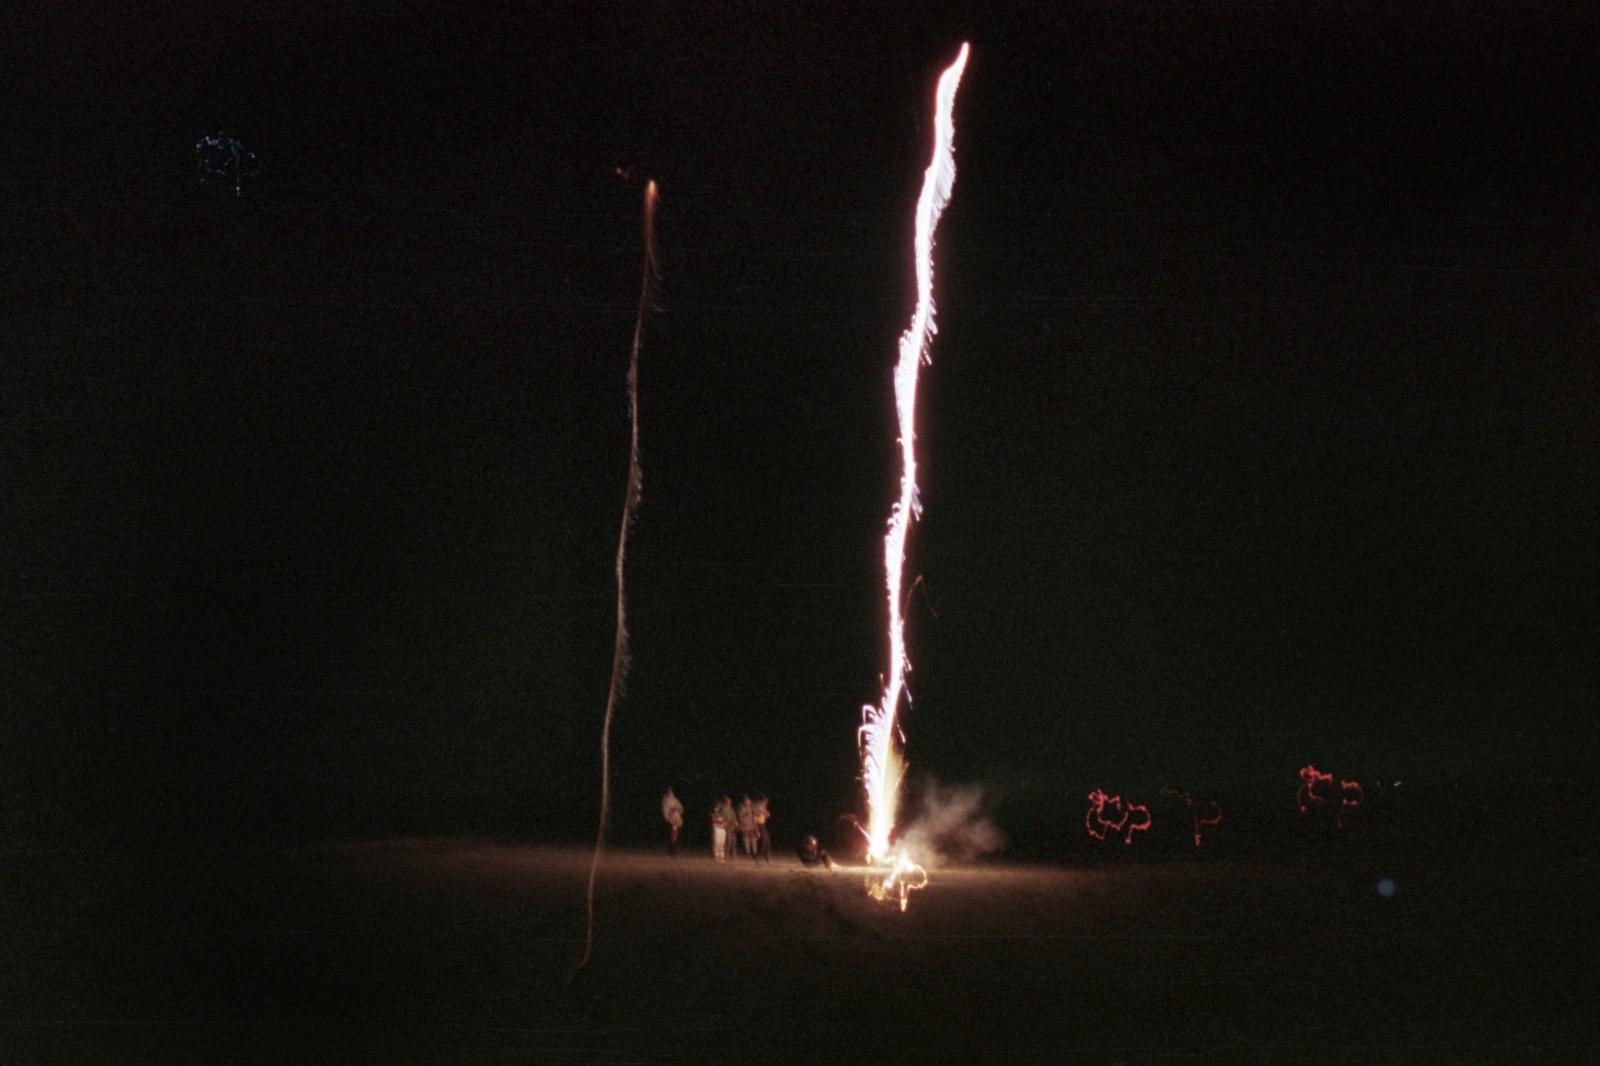 Setting off fireworks, Ryder Beach, MA